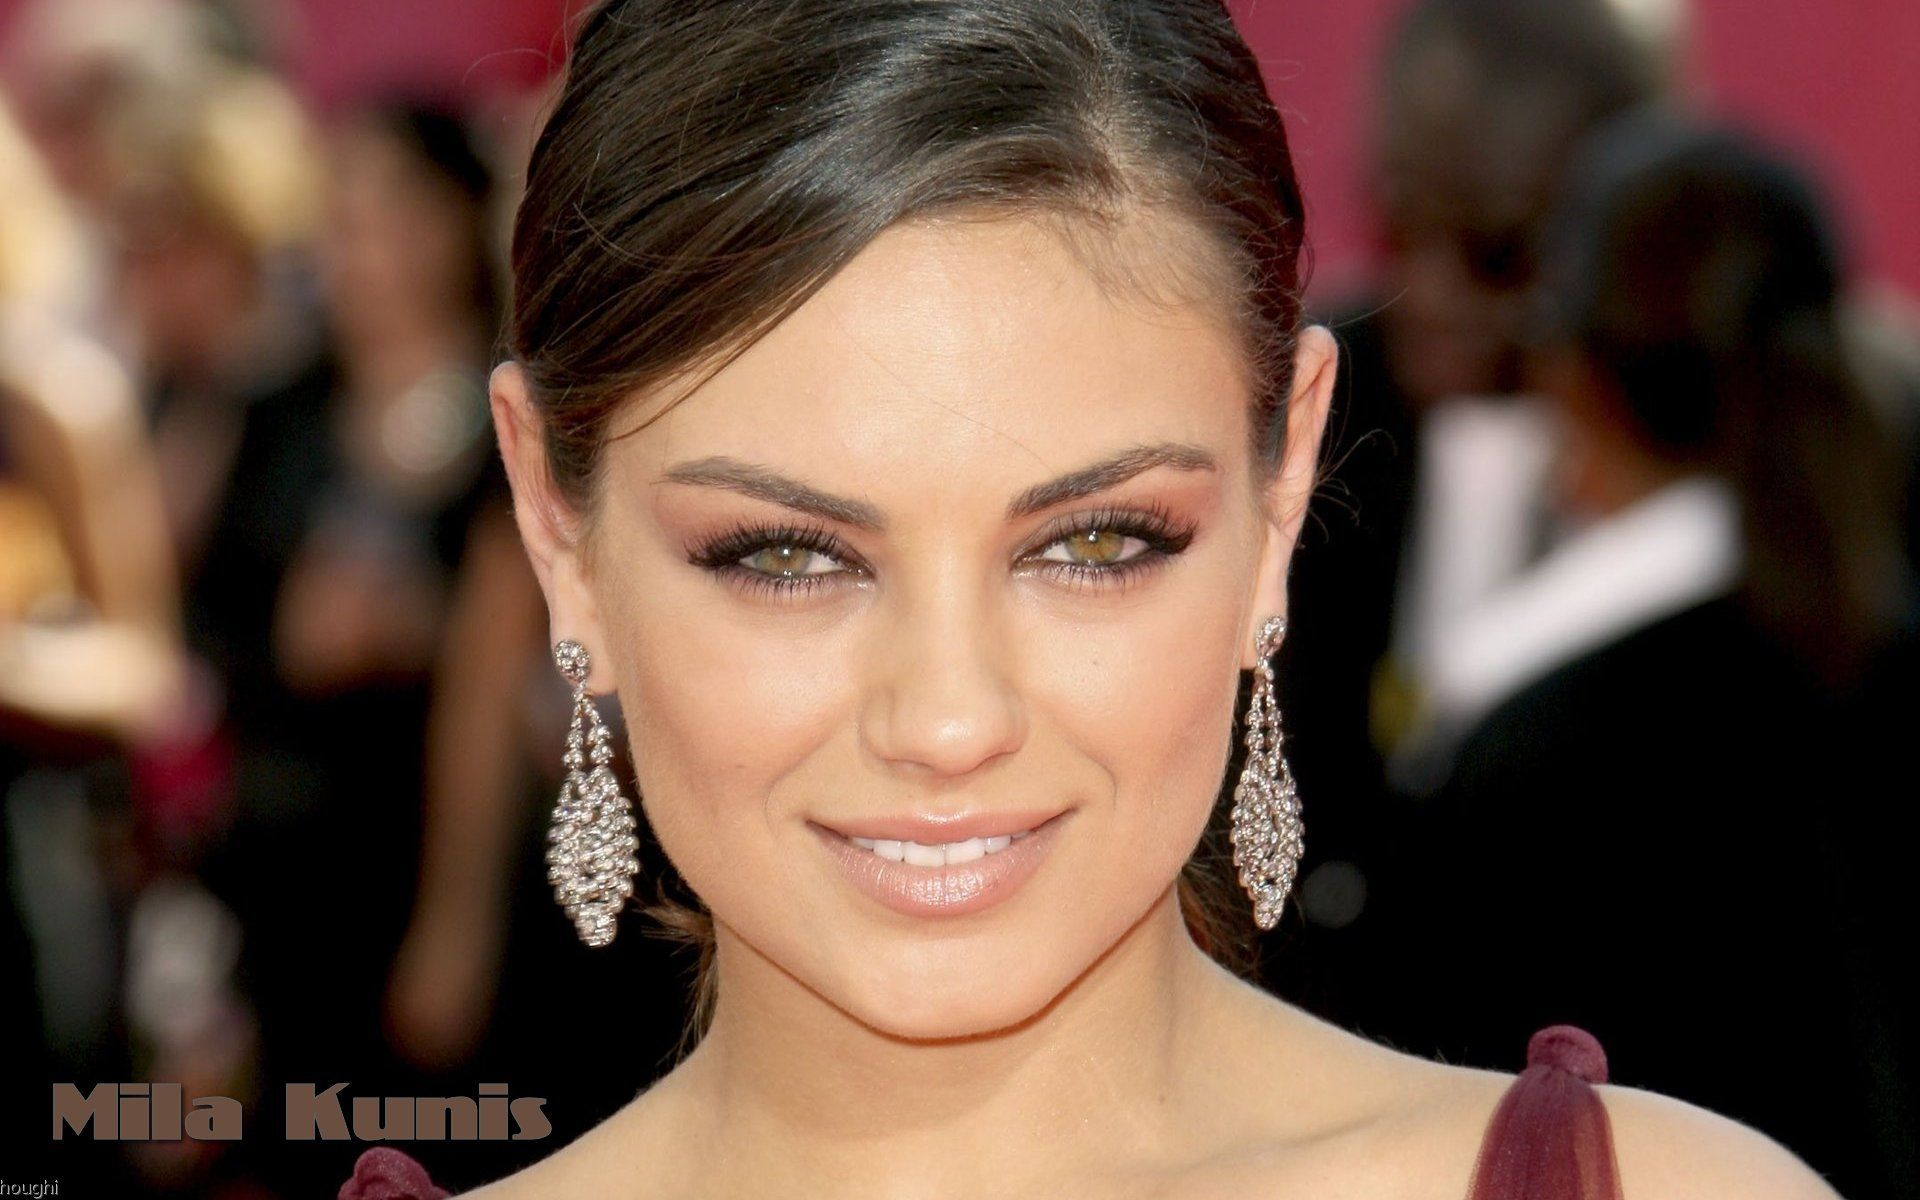 Mila Kunis con ojos verdes - 1920x1200